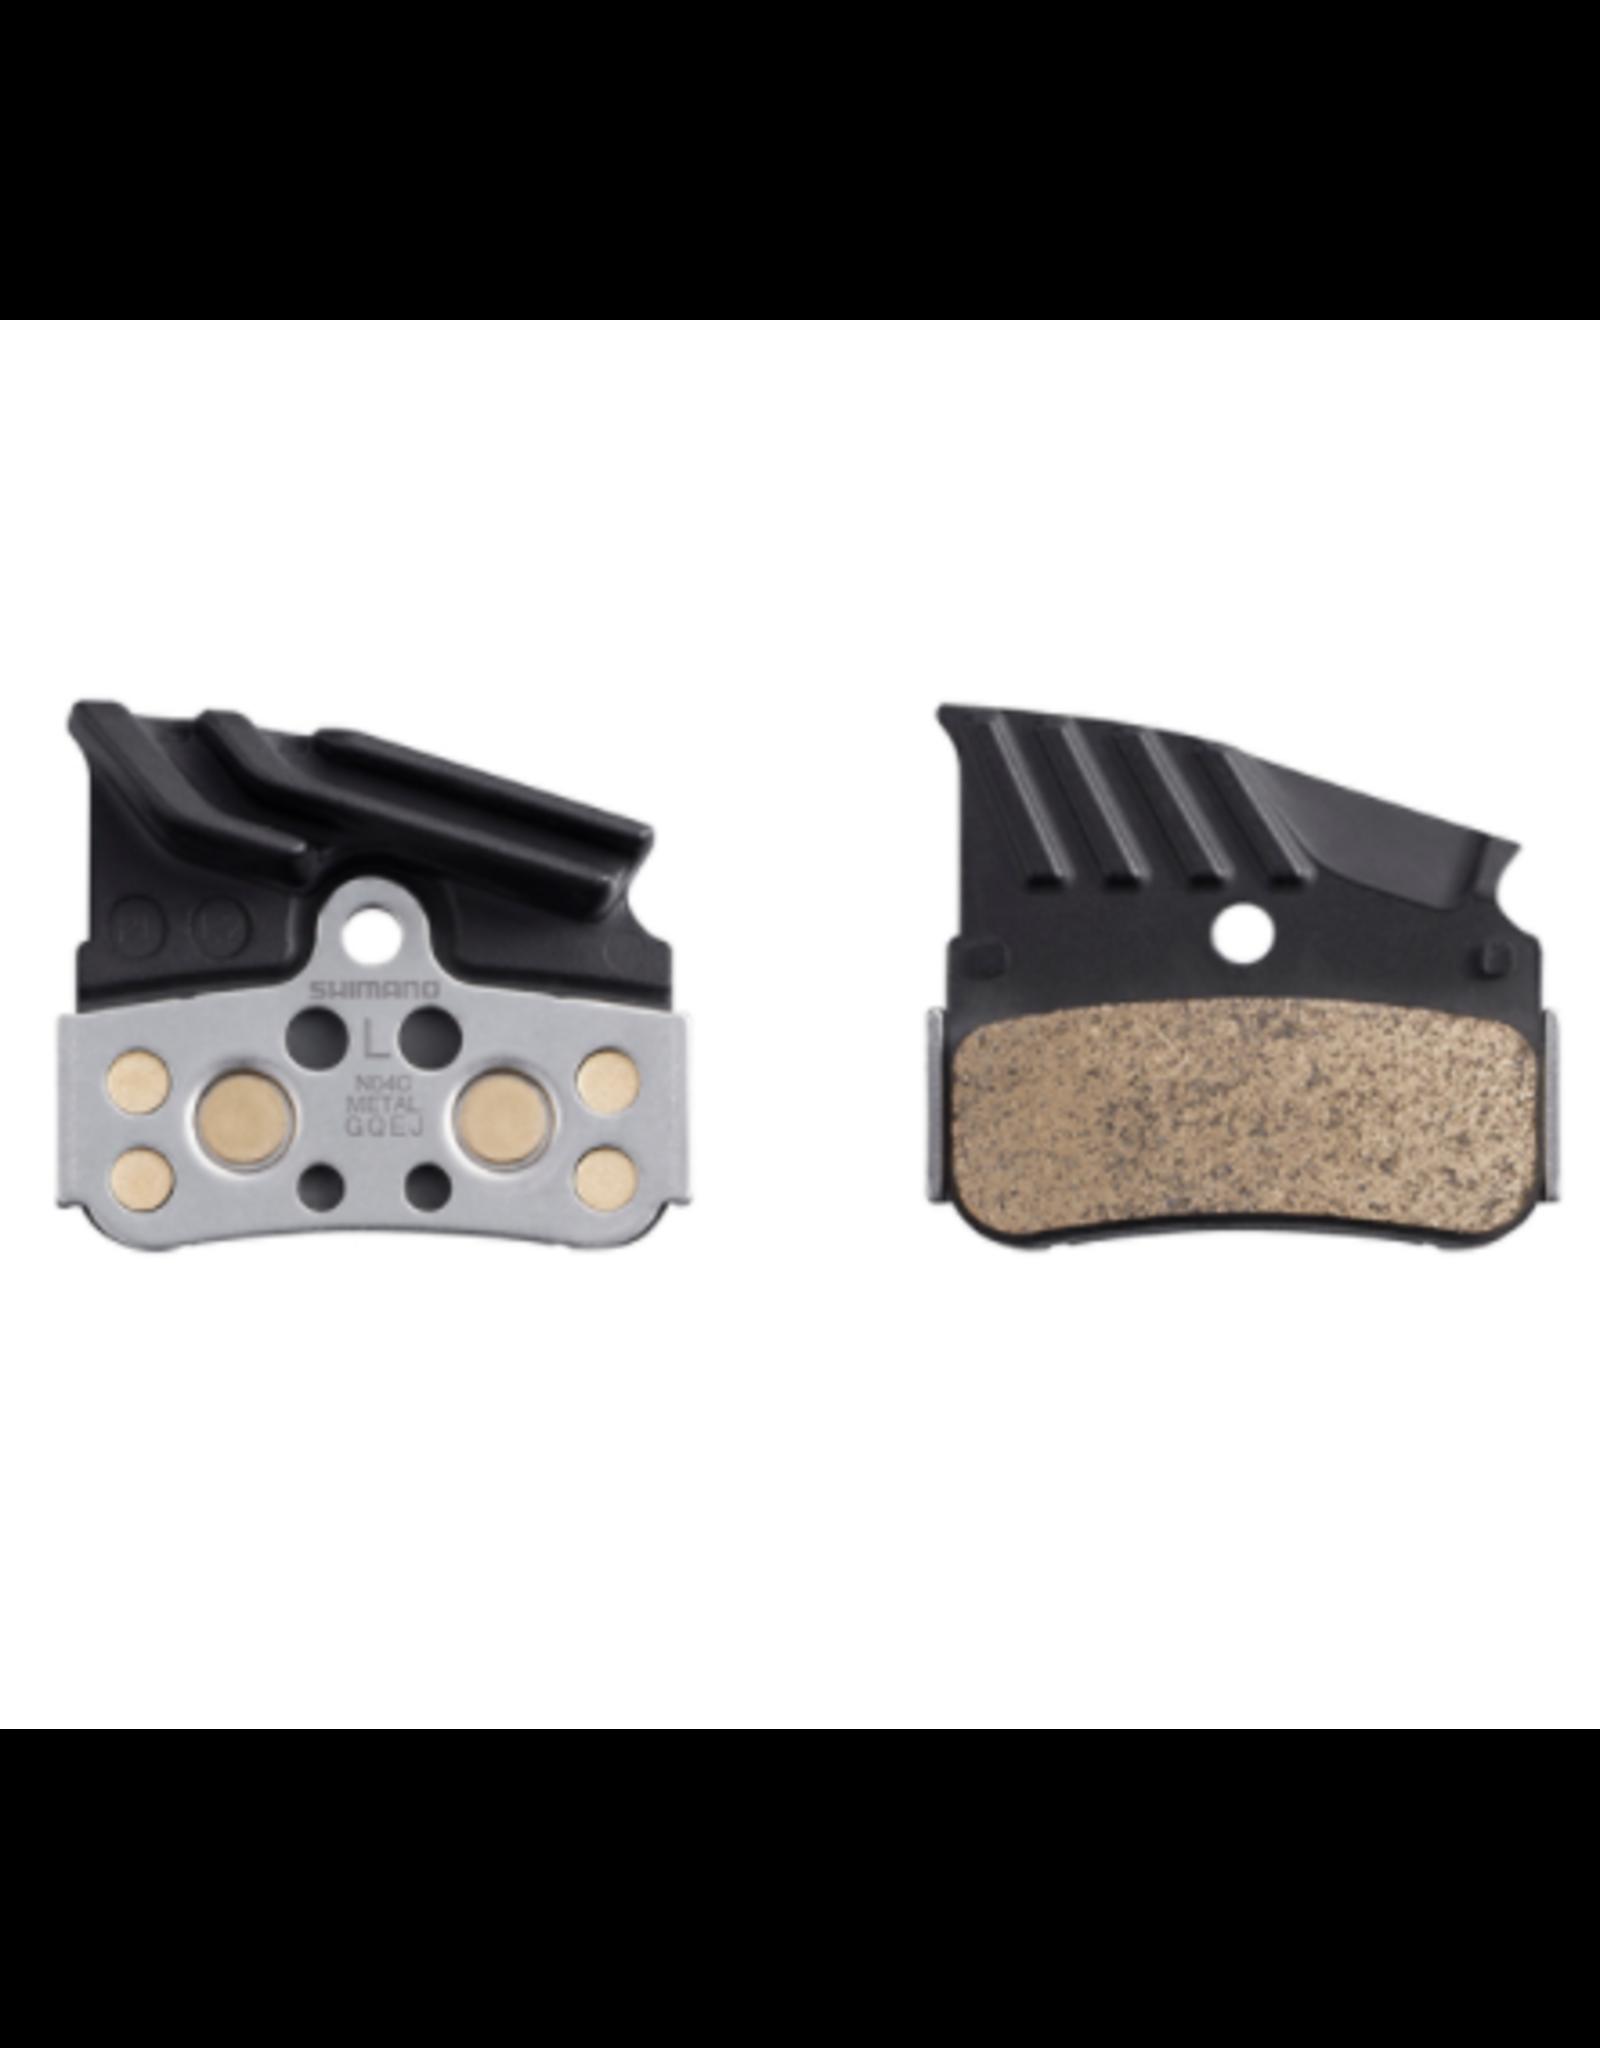 Shimano Plaquettes frein Shim N04C metal Ice (M9120, XT M8100, M7100) 4 pist